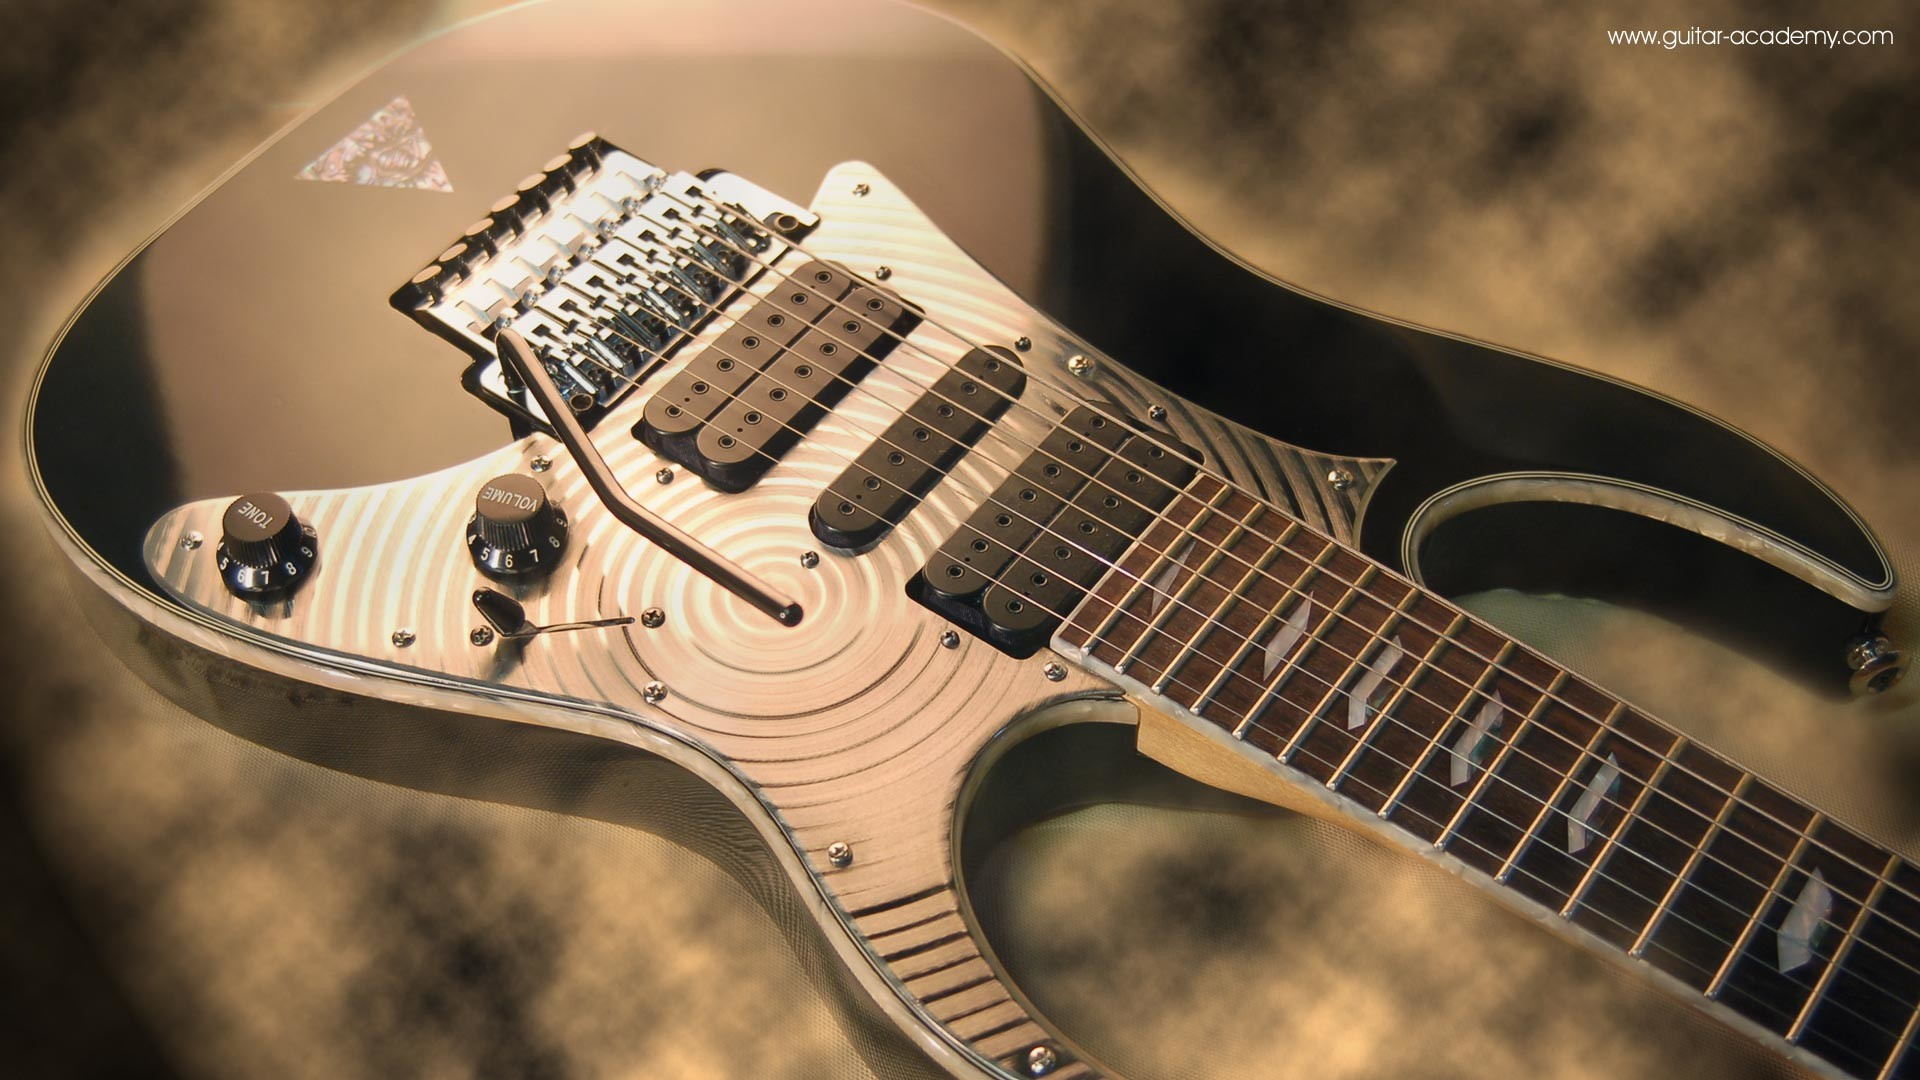 Guitar wallpaper, Ibanez Universe 7 string guitar body, custom scratchplate